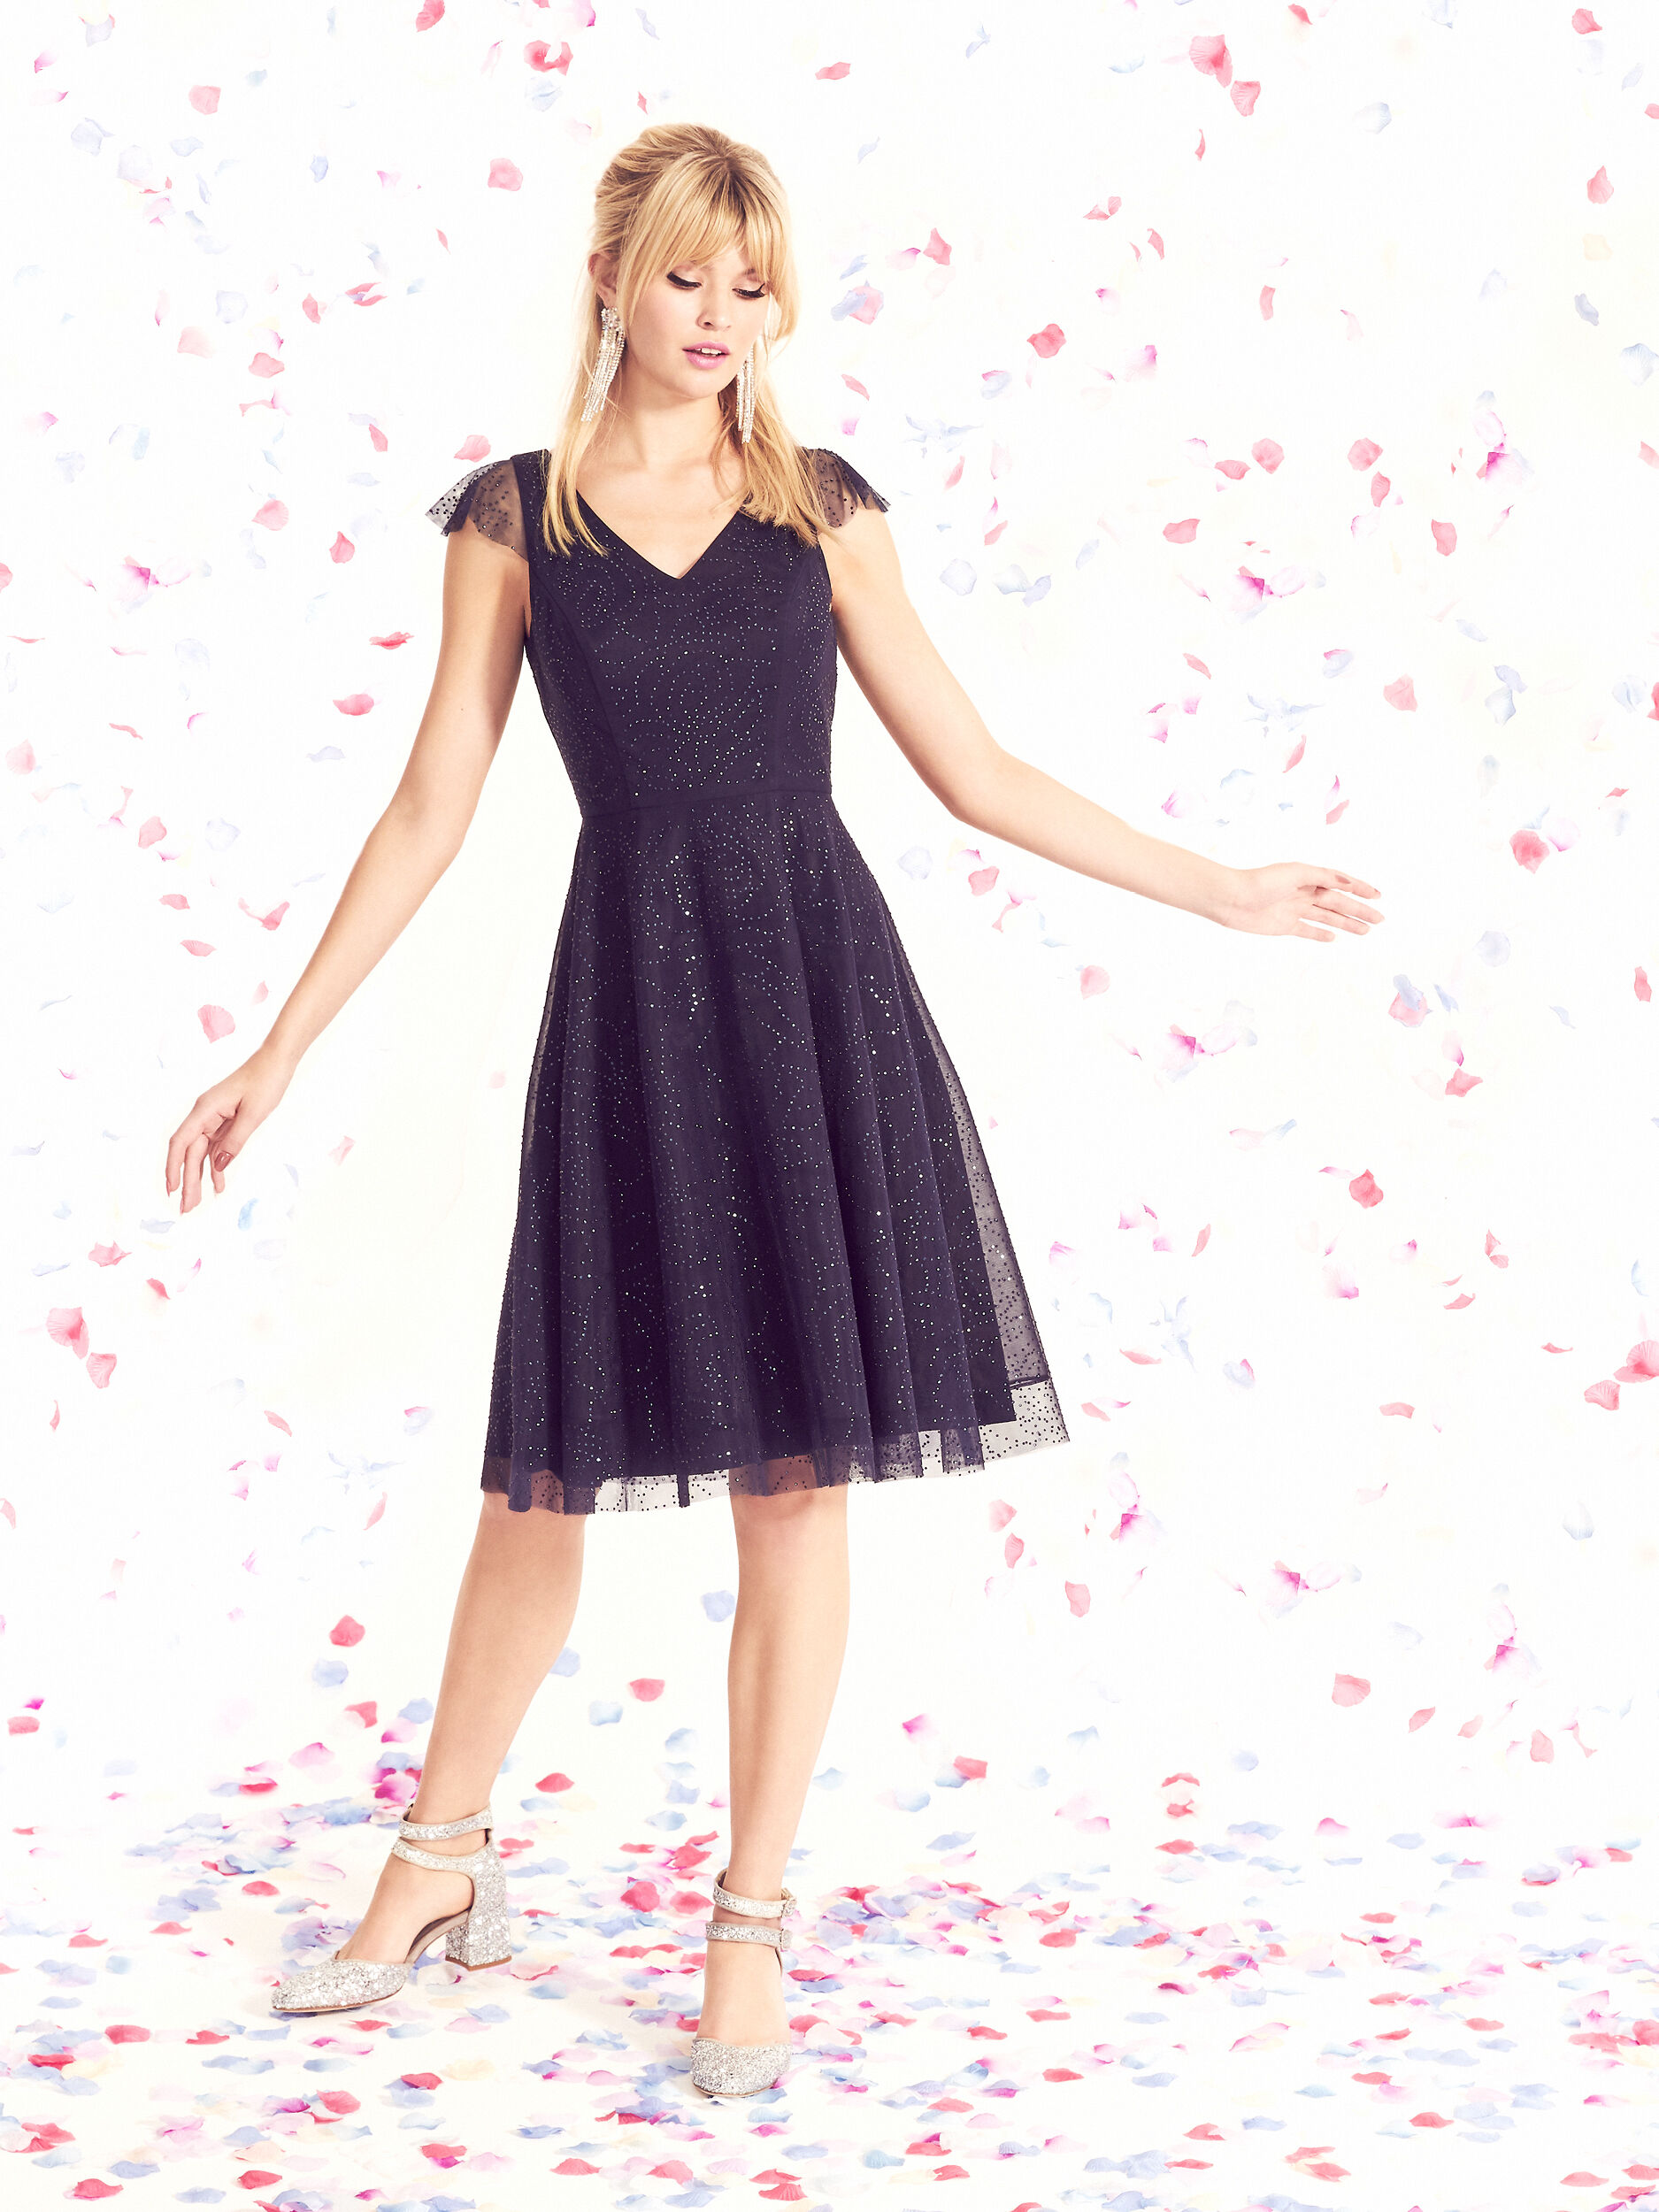 Raindrops On Roses Dress